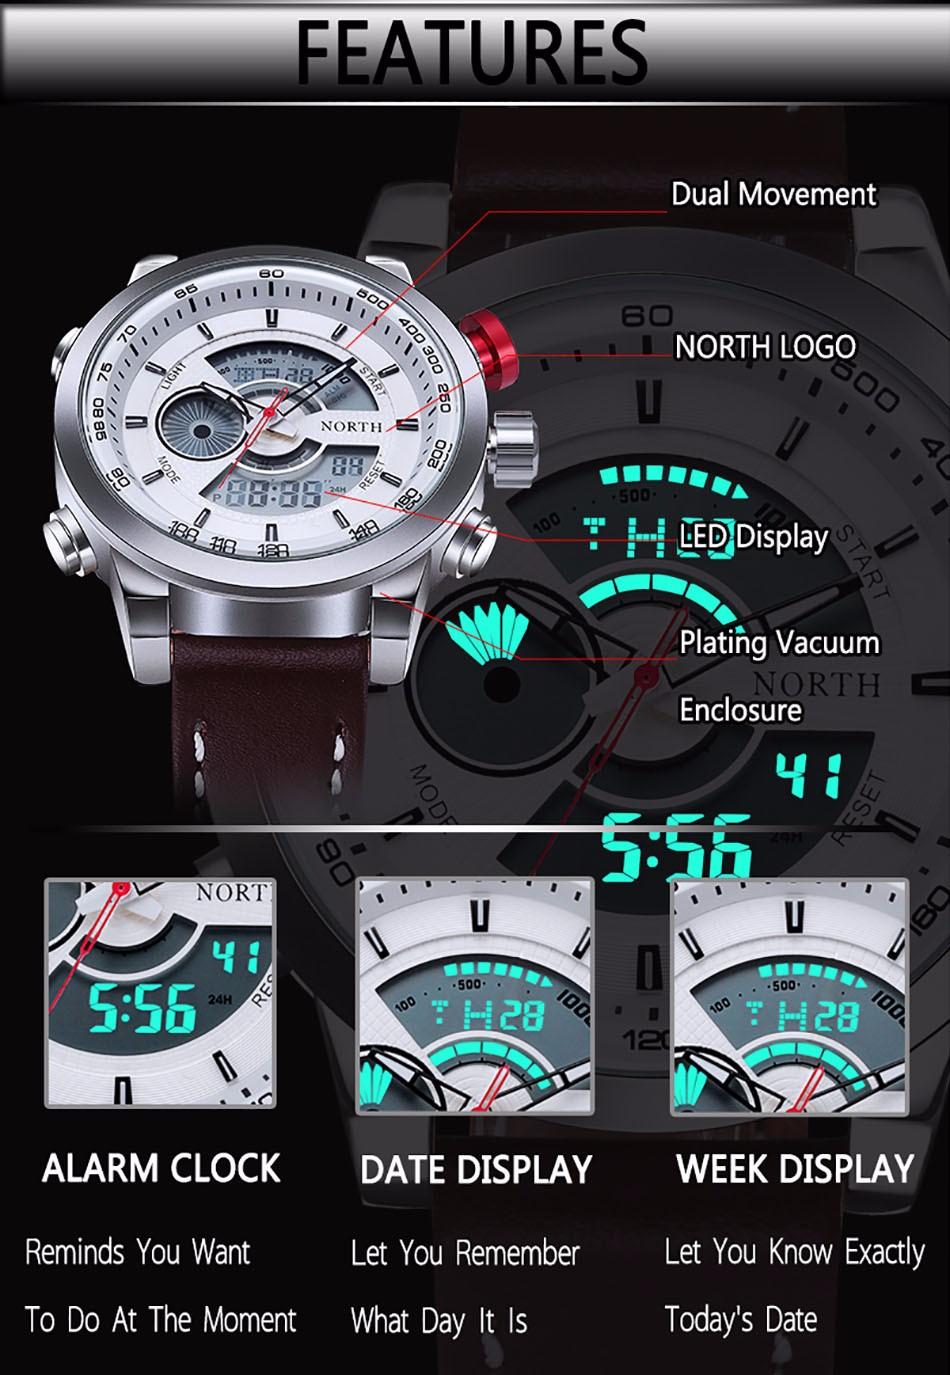 NORTH 30M Waterproof LED Digital Male Watches 2016 Genuine Leather Alarm Calendar Fashion Casual Quartz Men Sport Wristwatch